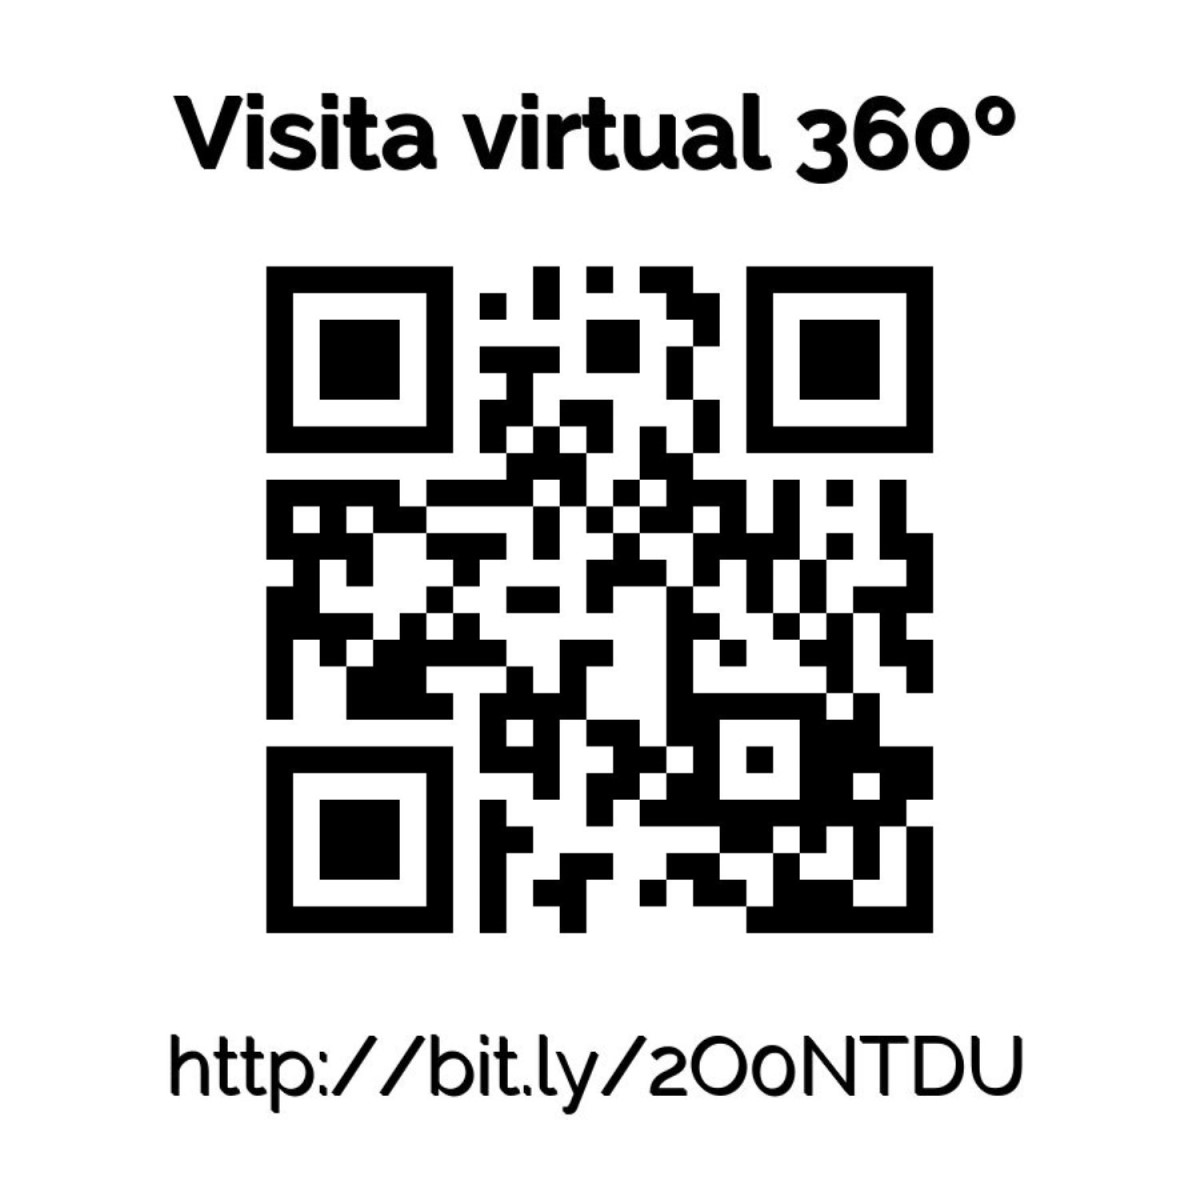 3408-03761